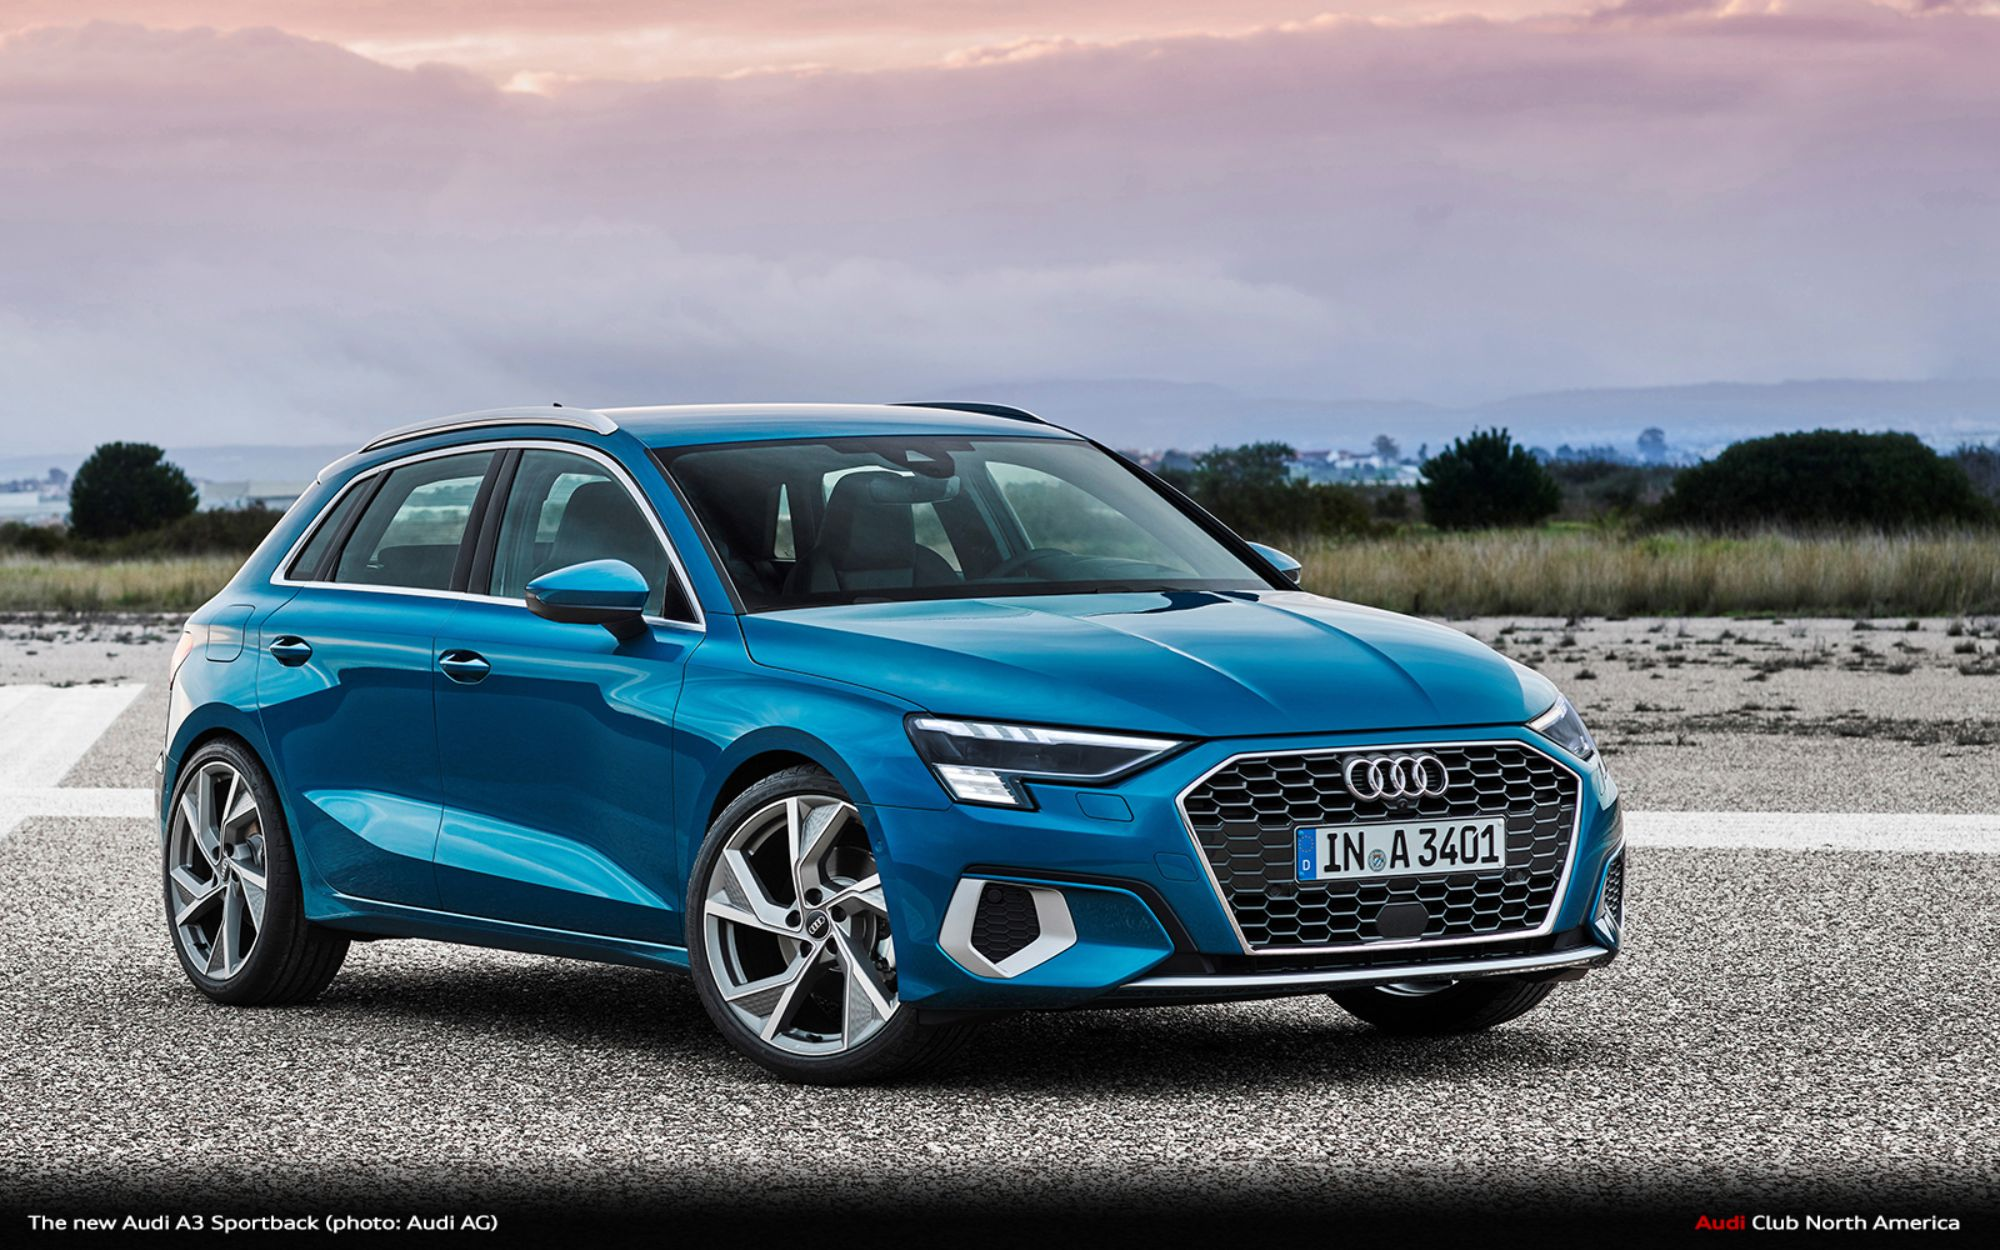 Success Model 4.0: The New Audi A3 Sportback